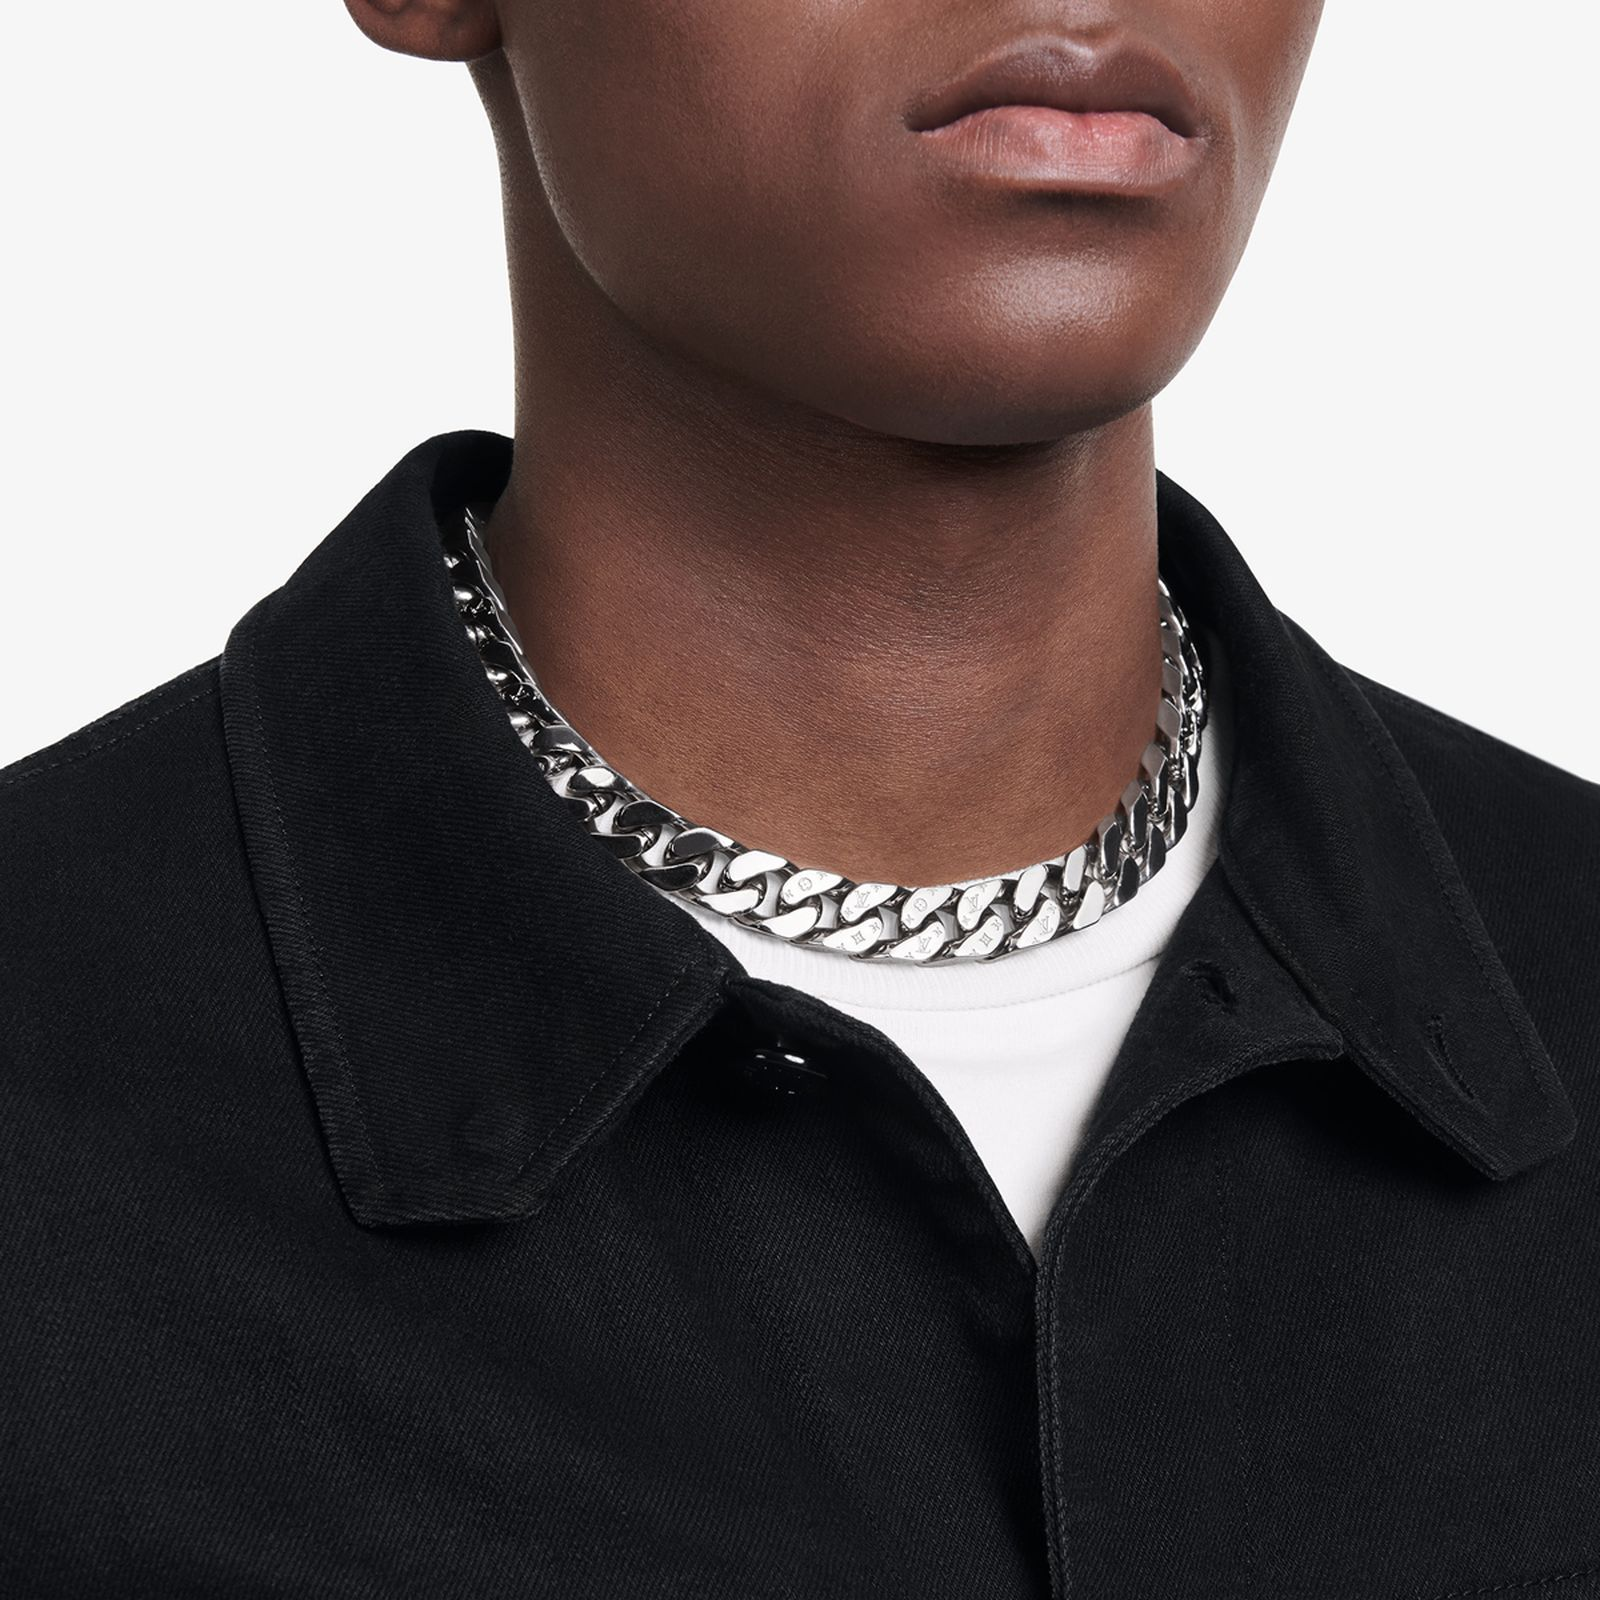 13louis-vuittons-mens-accessories-ss20